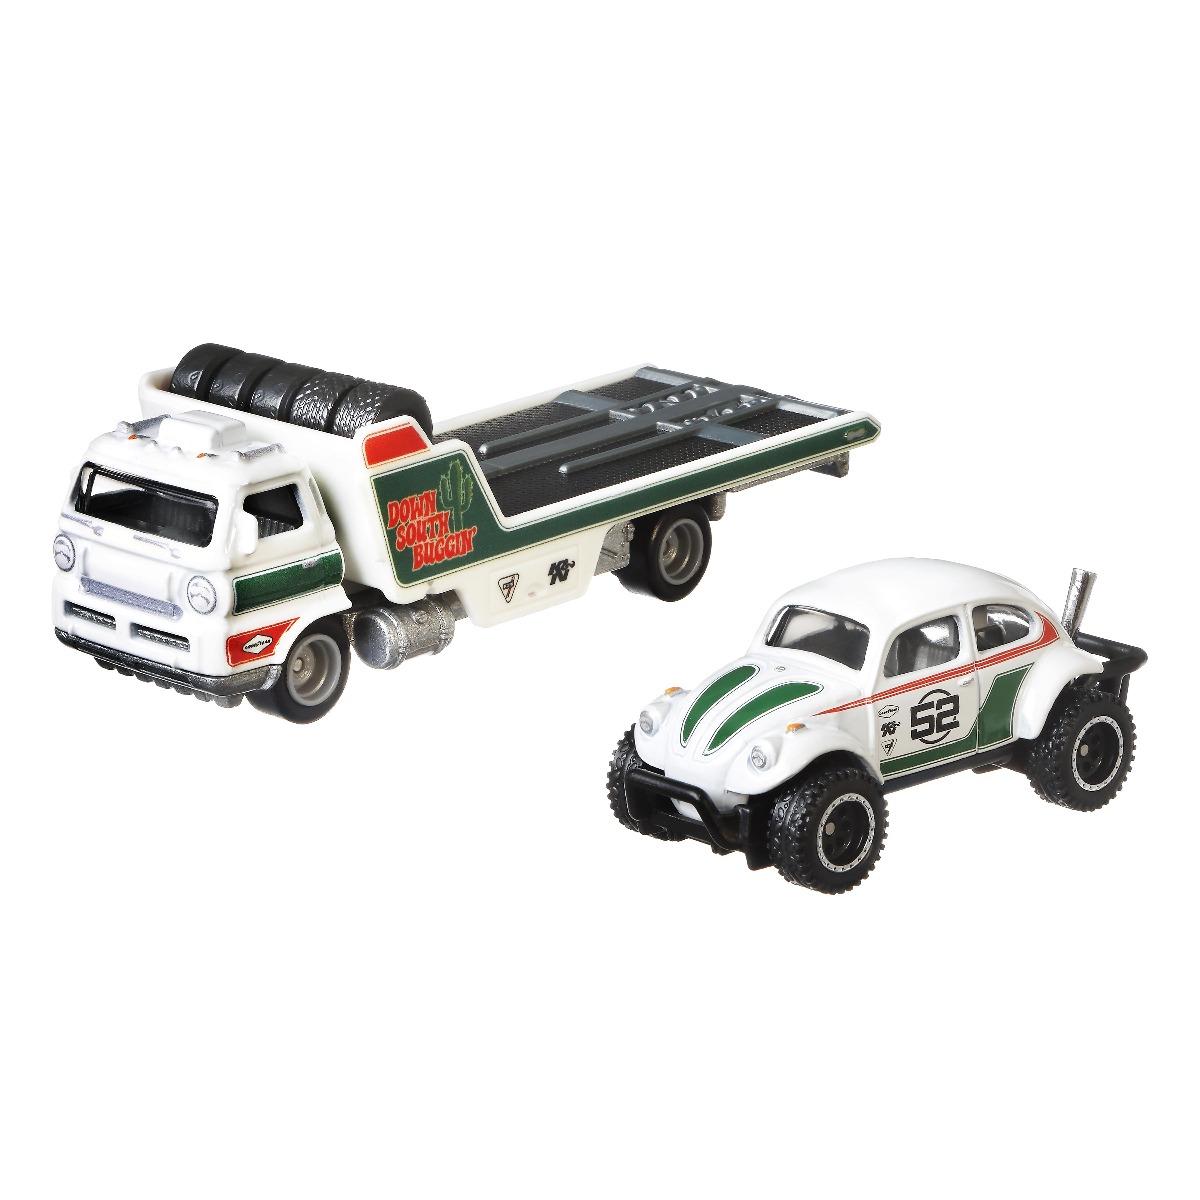 Transportator cu masinuta Hot Wheels, Volkswagen Baja Bug, Wide Open, 1:64 imagine